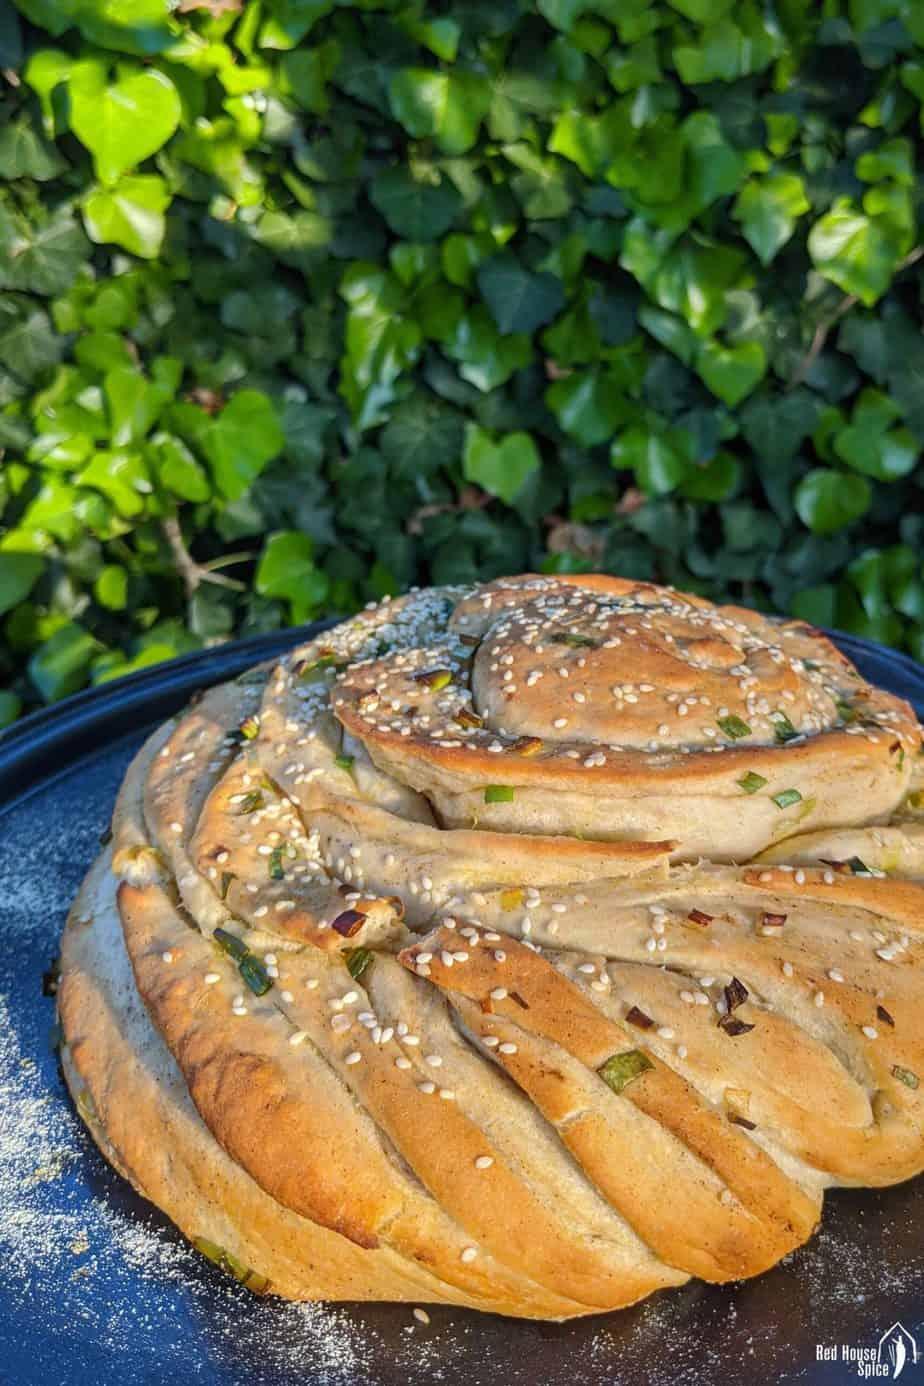 An oven baked scallion bread